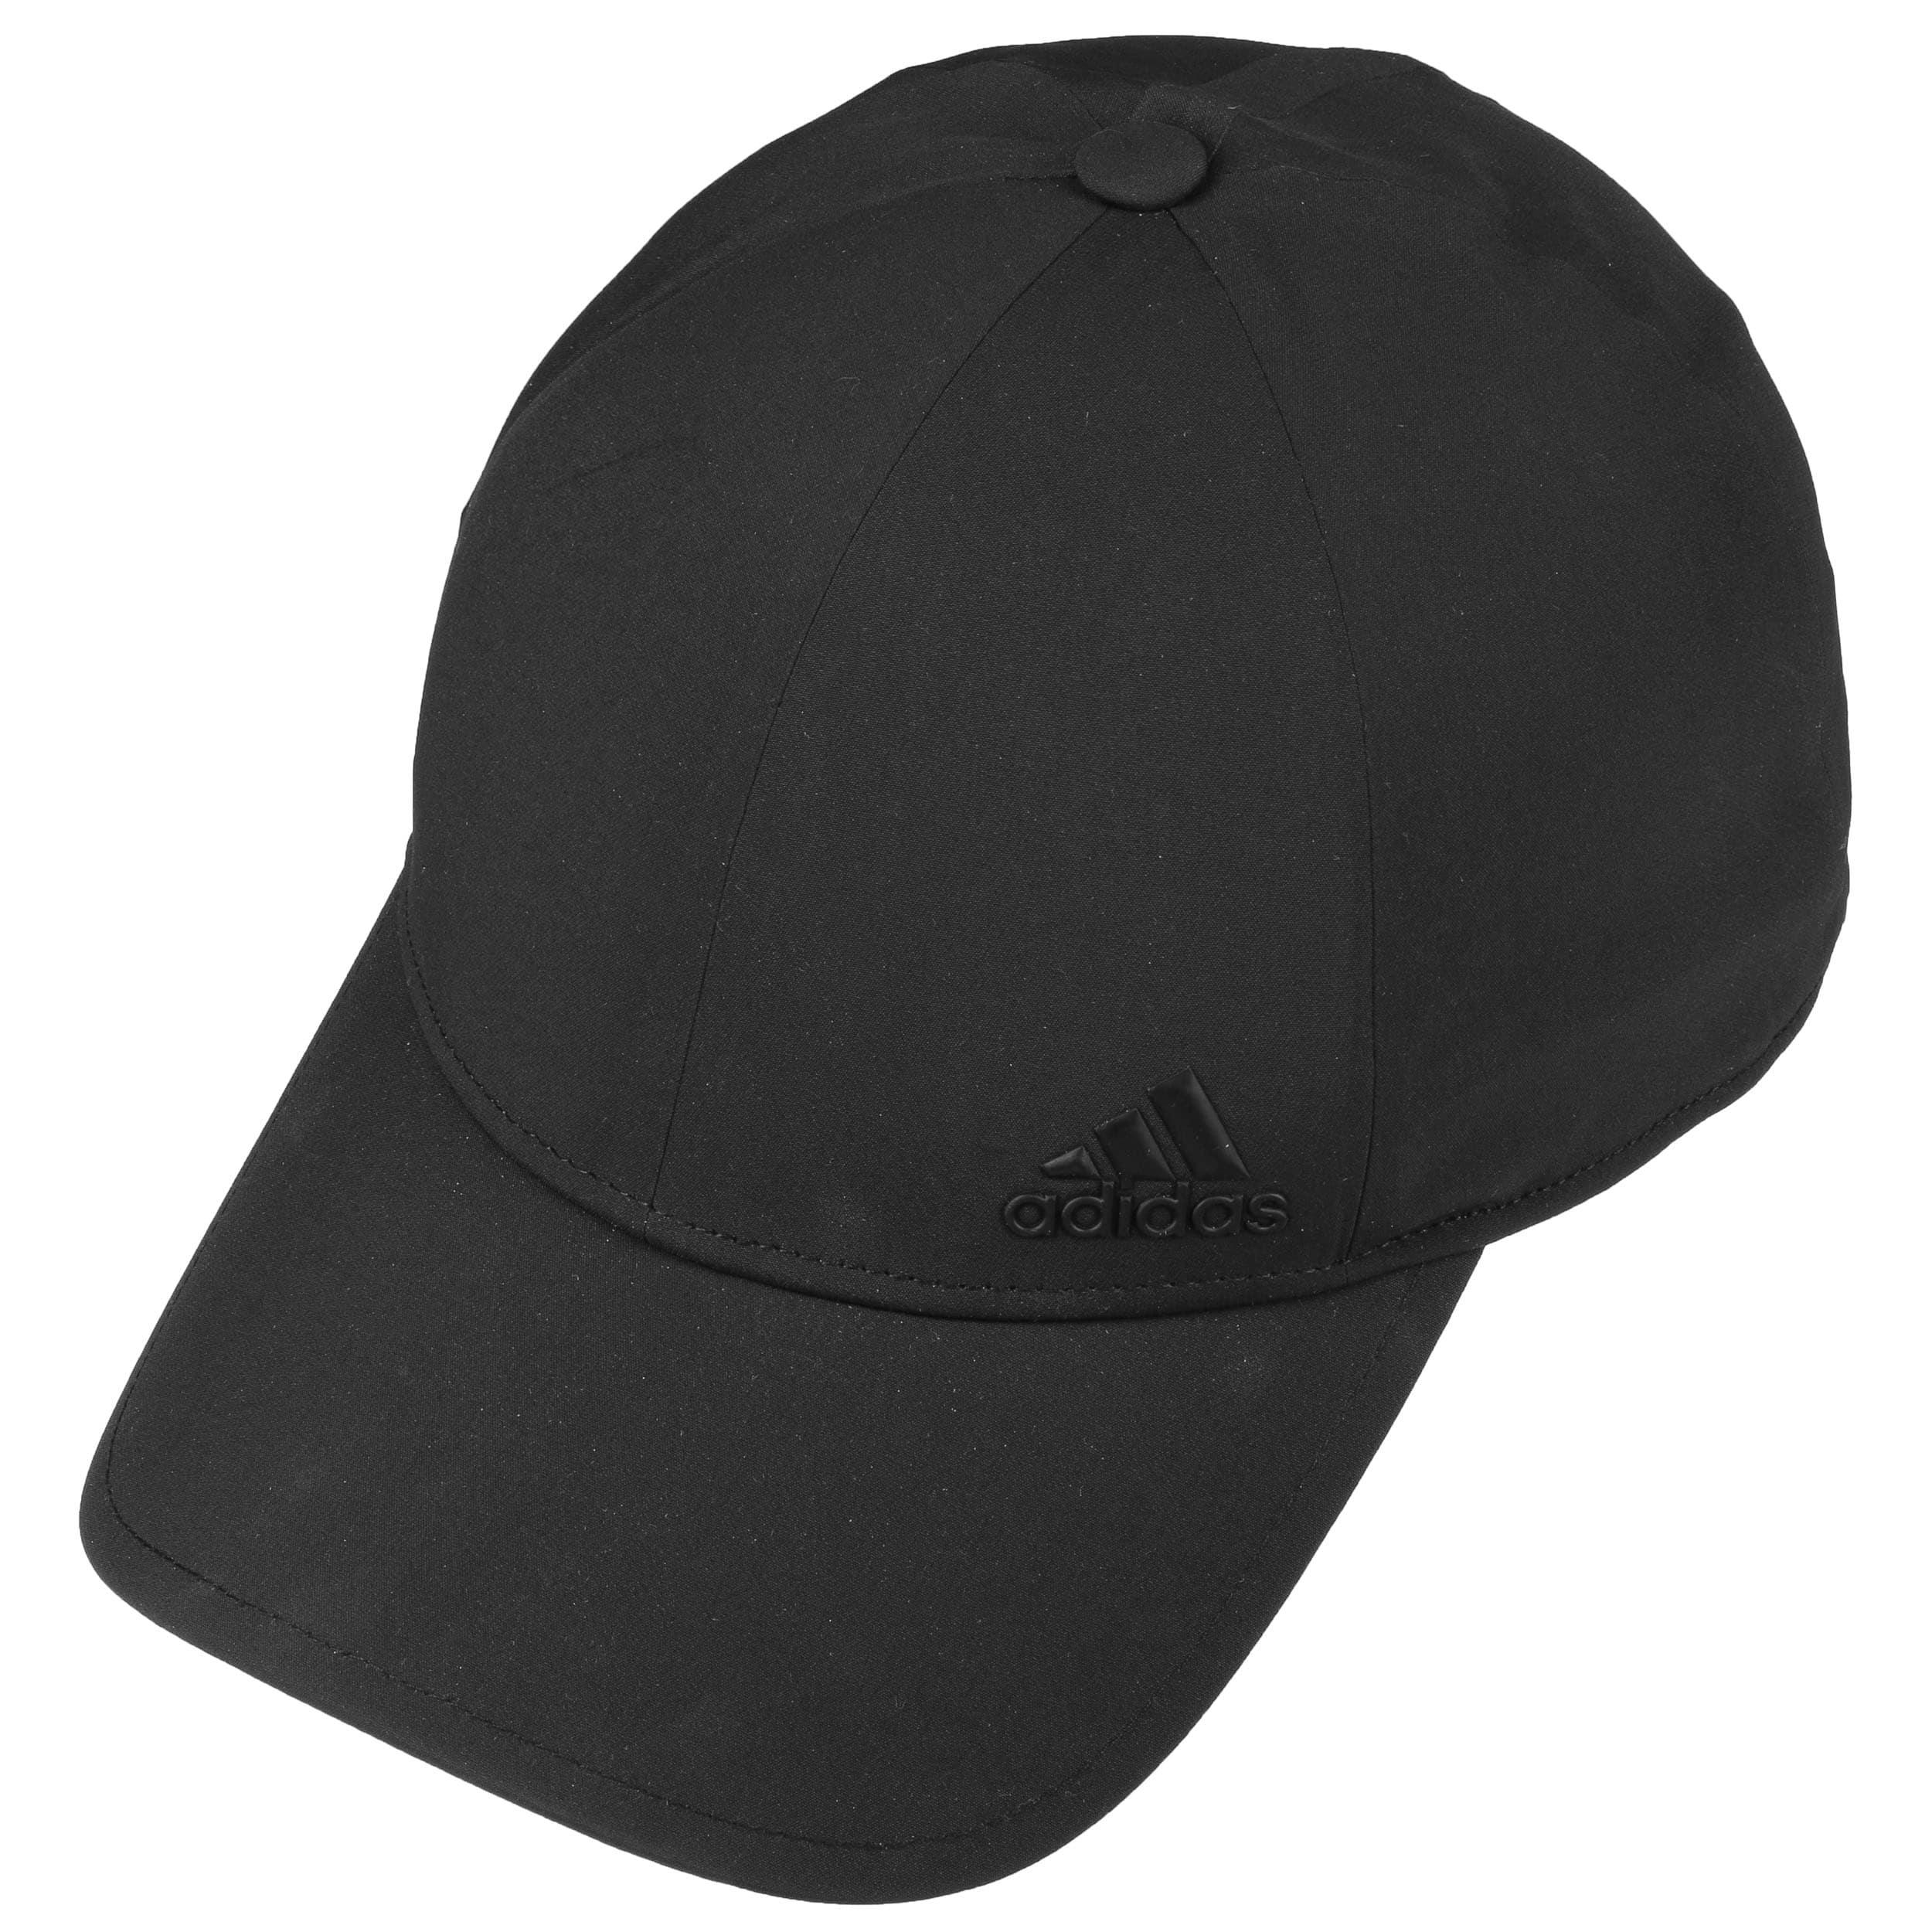 ... Cappellino Bonded by adidas - nero 1 ... 009a7249efa6